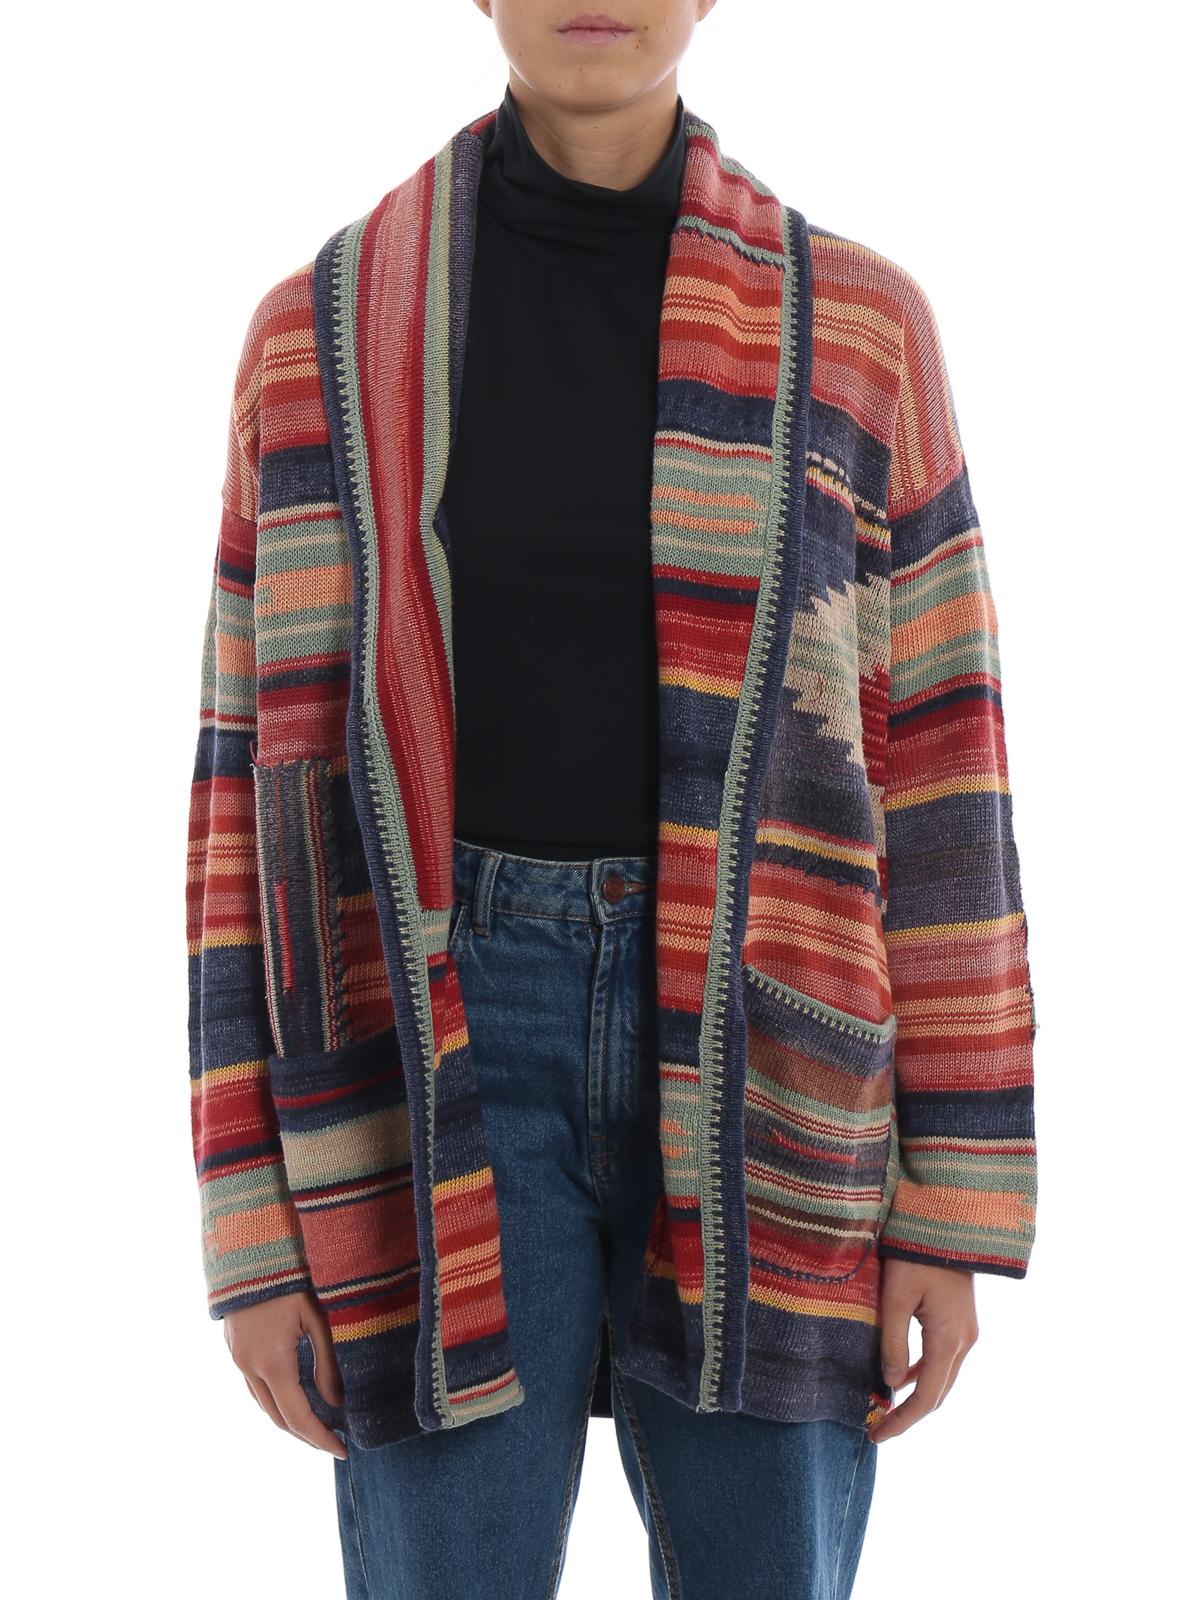 Ralph Polo Multicolore Lauren 211704993001 Cardigans Cardigan xedCroB